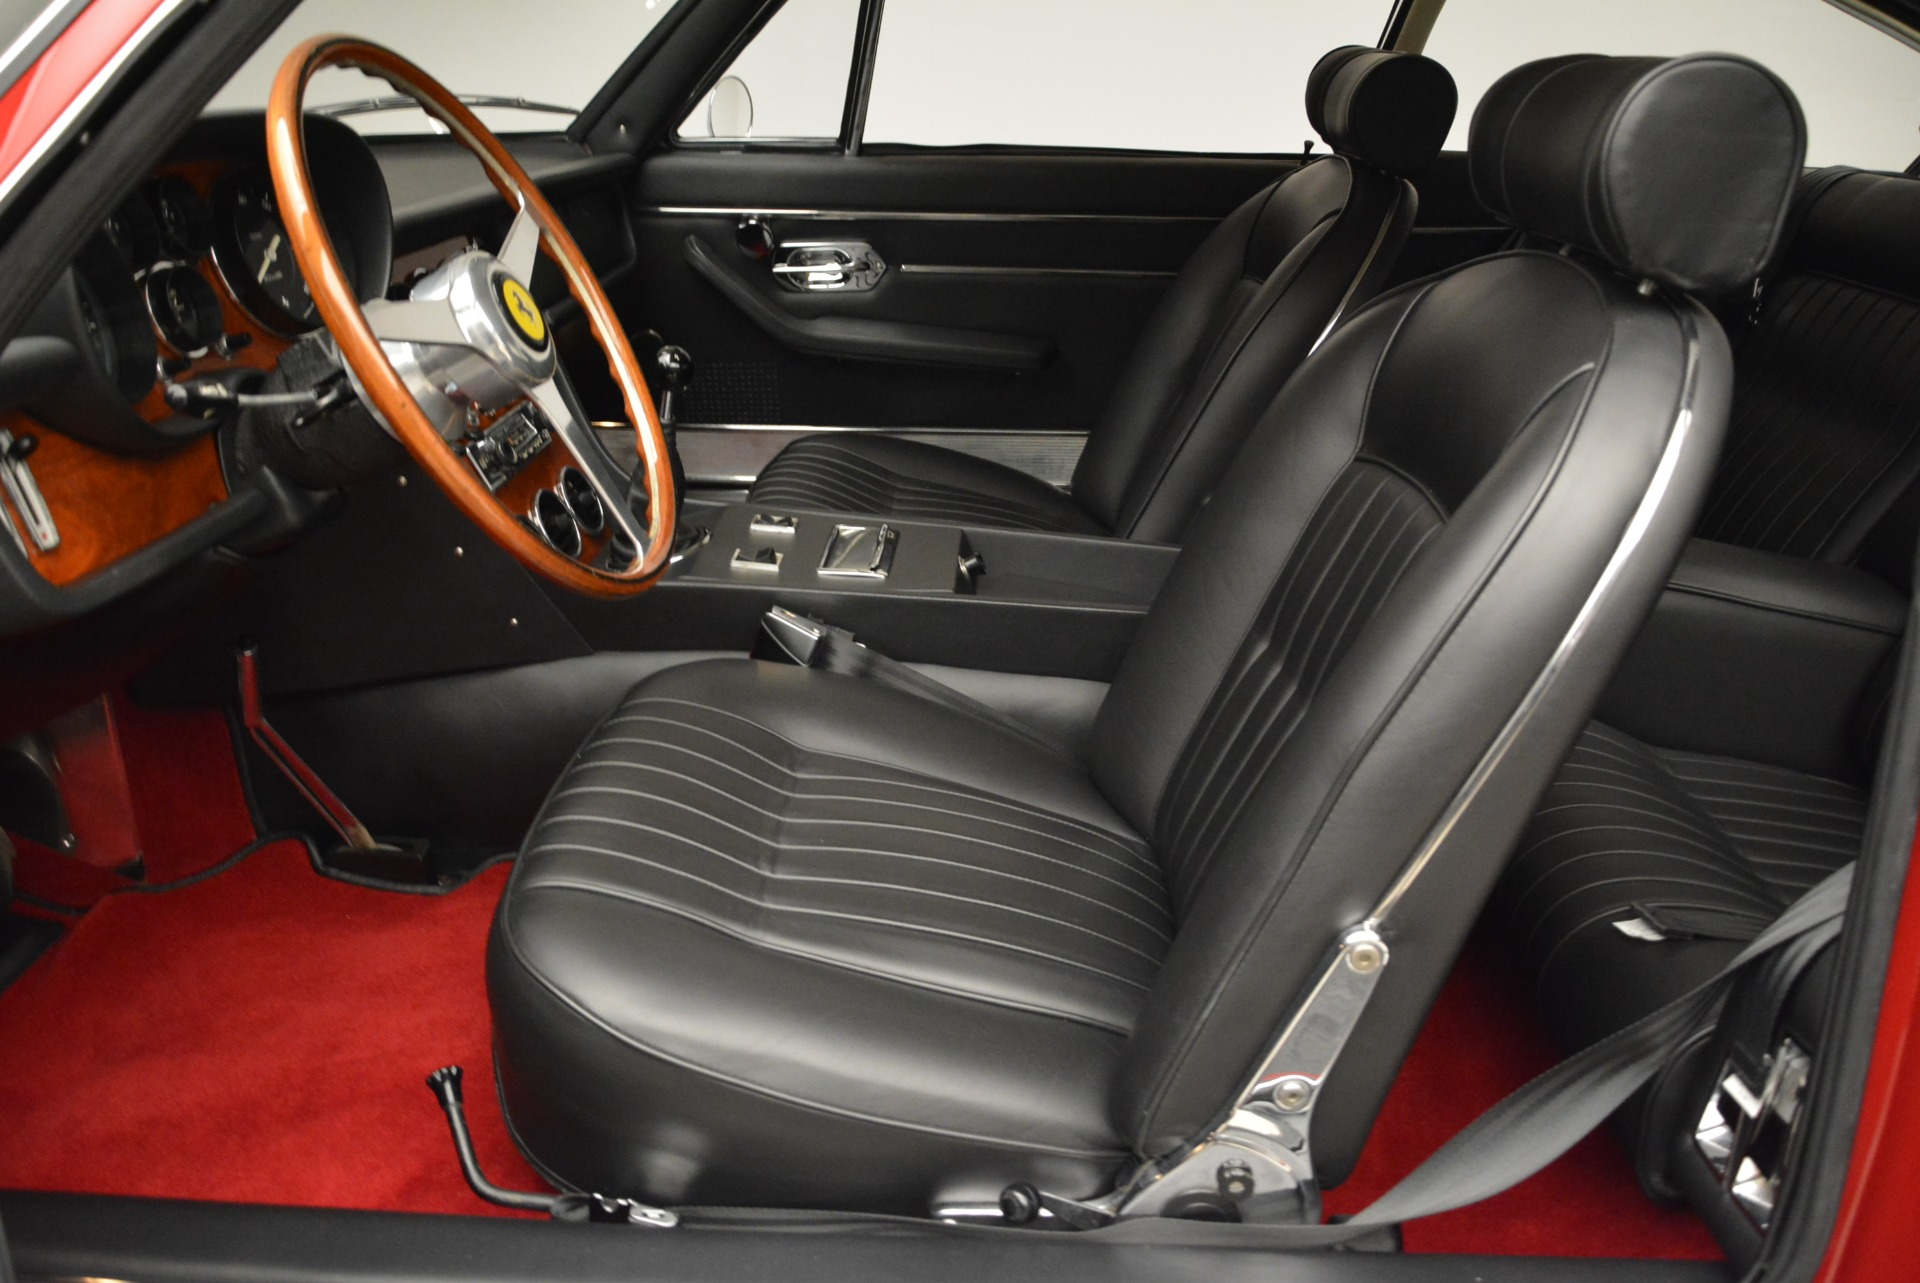 Used 1969 Ferrari 365 GT 2+2  For Sale In Westport, CT 1995_p14